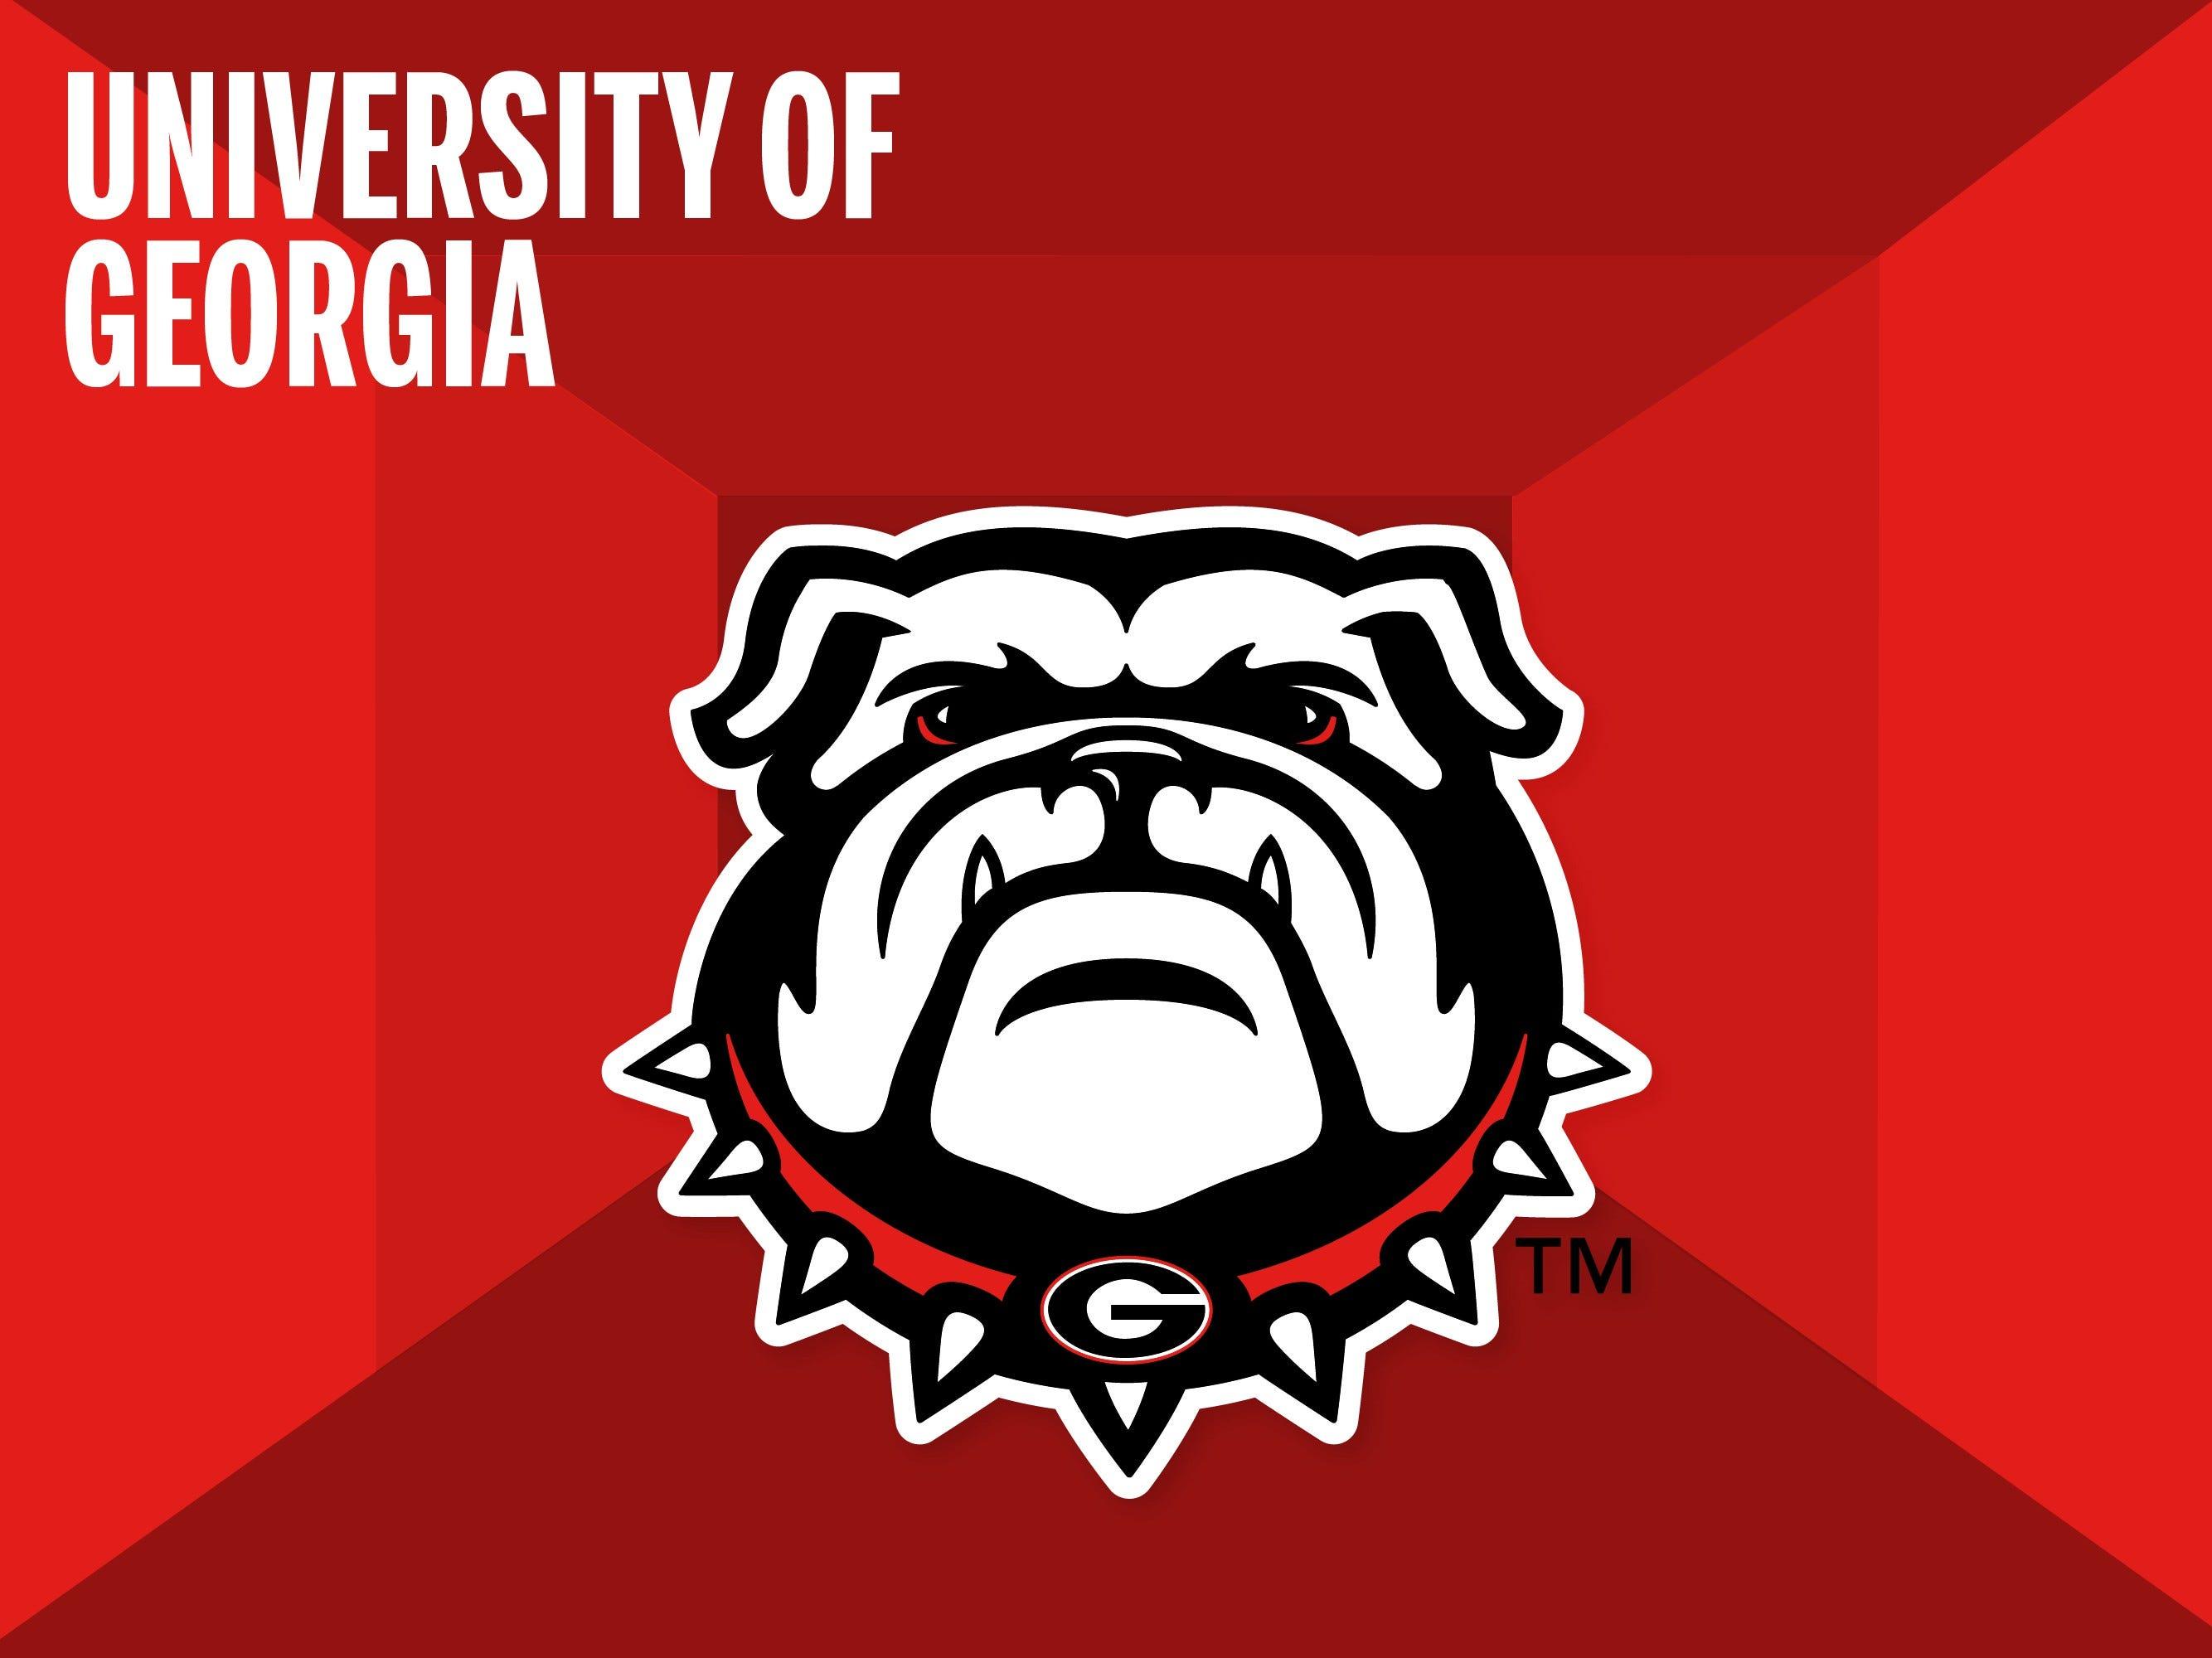 University of Georgia College Football Shop